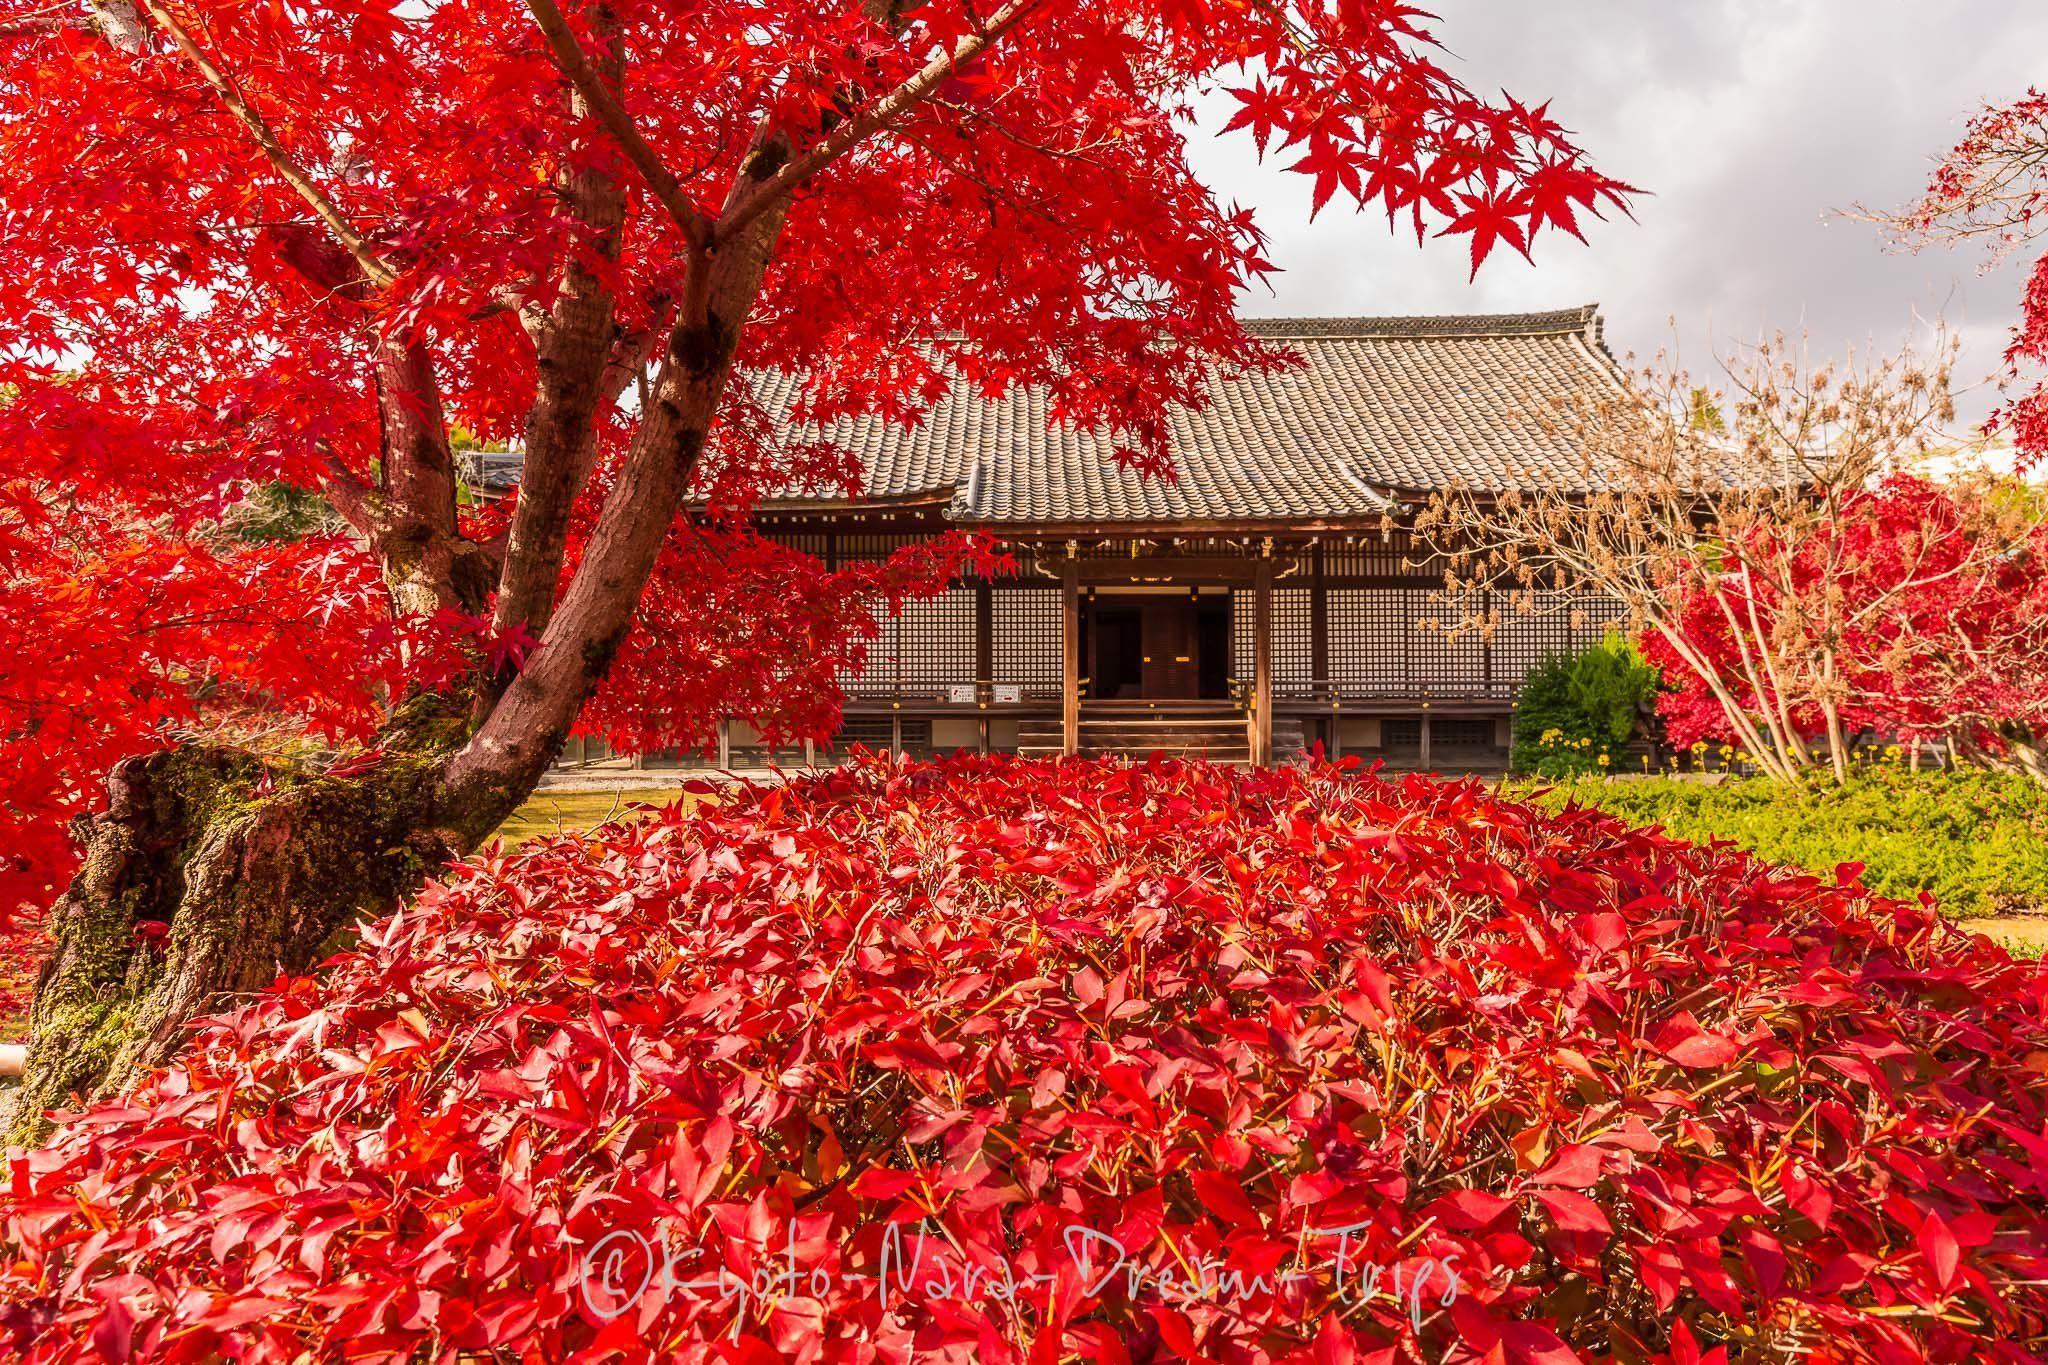 Autumn Scenery at Kaju-ji Temple, Yamashina-ku, Kyōto City-Japan. #autumnscenery Selection of pictures during the autumn season 0f 2018 in Kyoto-City. Pictured here the gardens of Kaju-ji in Yamashina. #autumnscenery